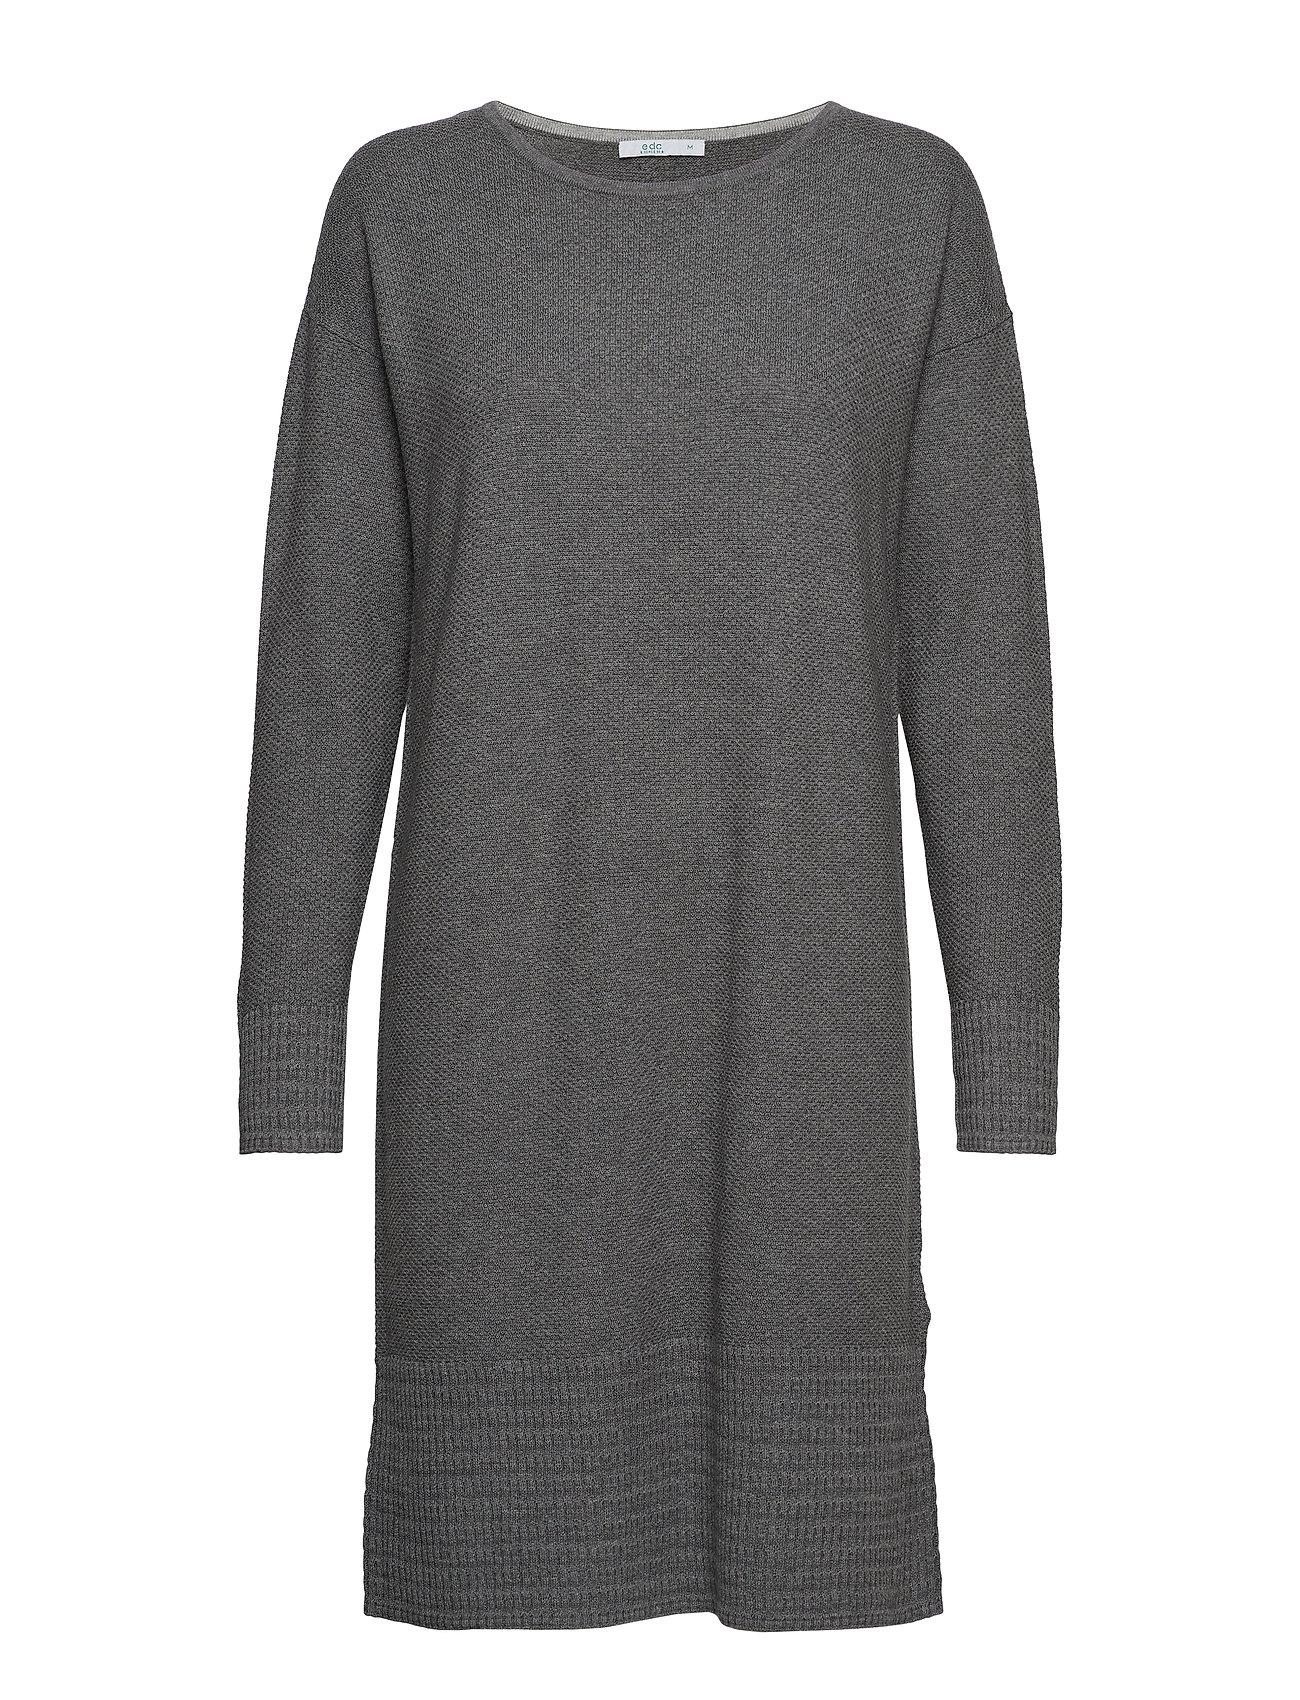 By Dresses Flat Knittedgunmetal Esprit 5Edc hdCsBQrxt